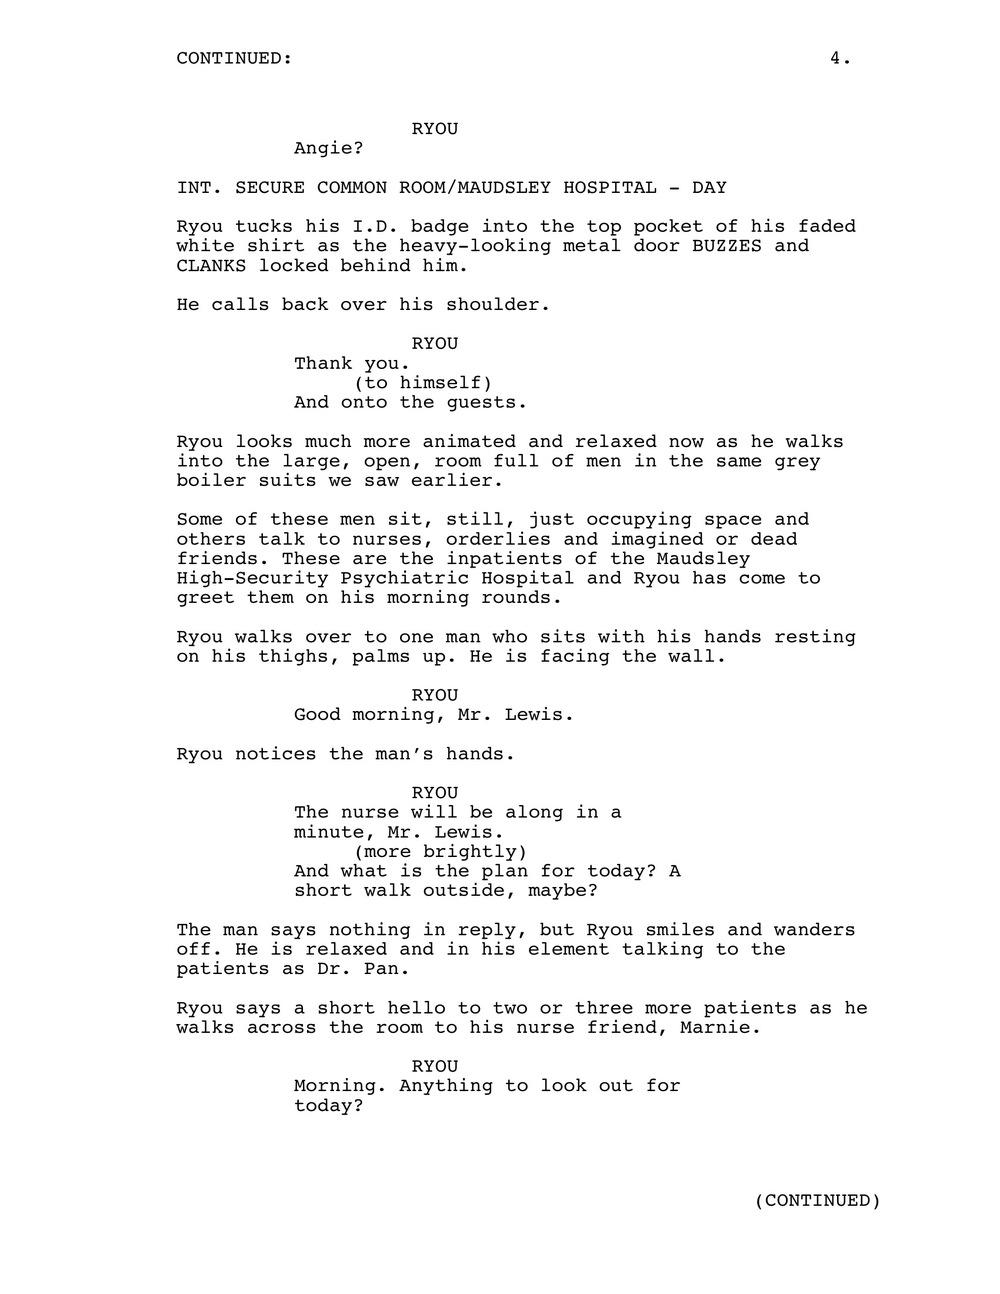 'Introducing Henry Charles' (Pilot) by Alexander Craig | 4.jpeg